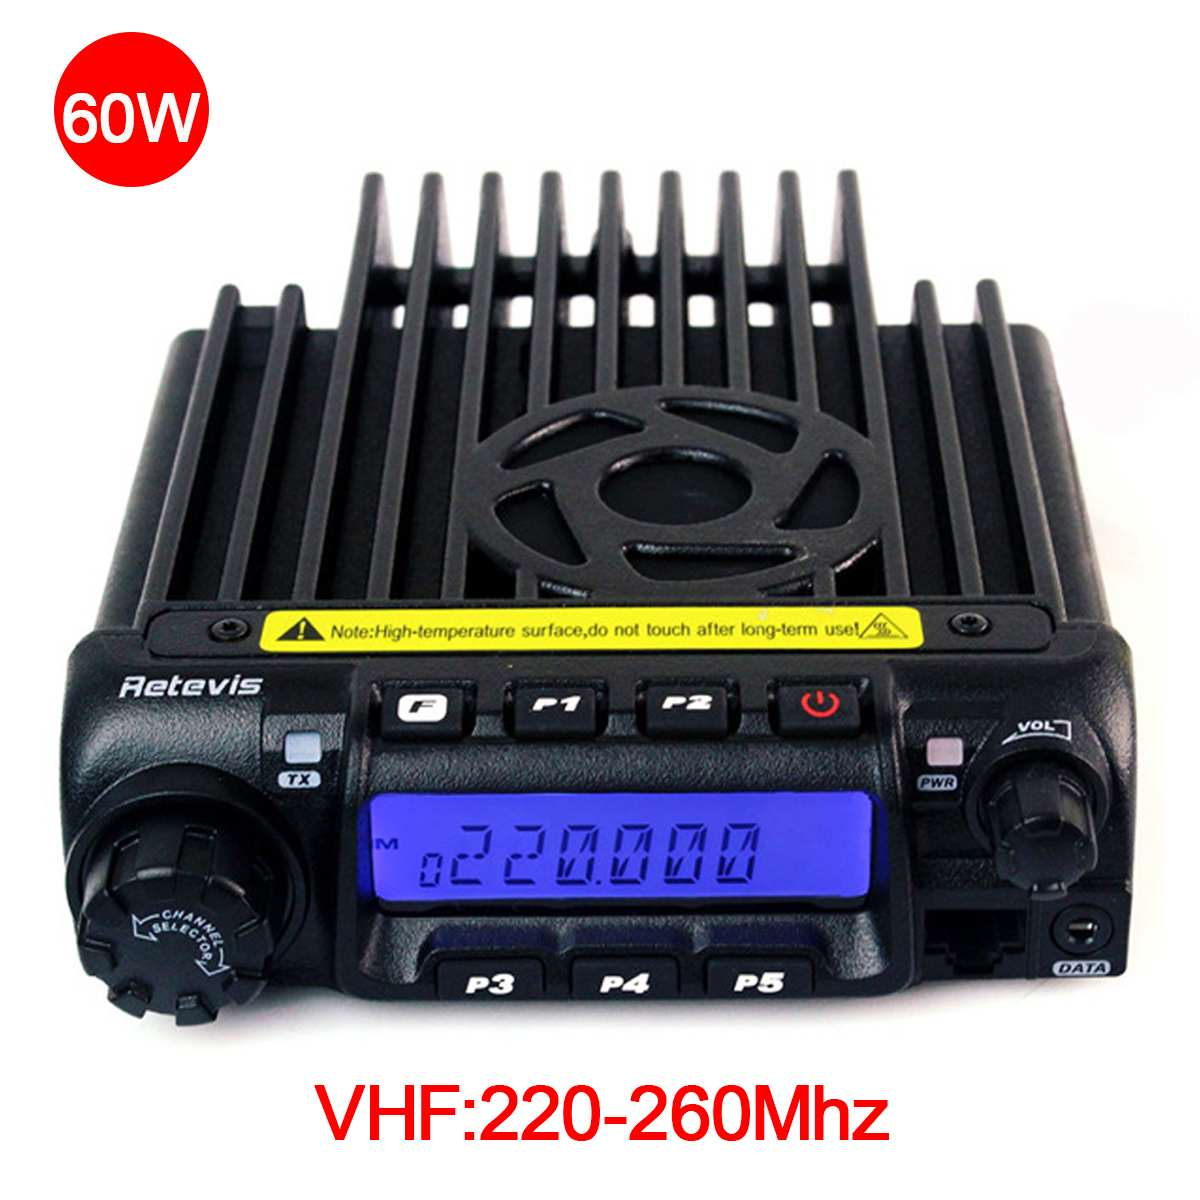 Retevis RT-9000D Auto Mobile Radio Ricetrasmettitore VHF 220-260 (o UHF) 60 W 200CH Scrambler Walkie Talkie + Speaker MIC + Cavo di ProgrammaRetevis RT-9000D Auto Mobile Radio Ricetrasmettitore VHF 220-260 (o UHF) 60 W 200CH Scrambler Walkie Talkie + Speaker MIC + Cavo di Programma